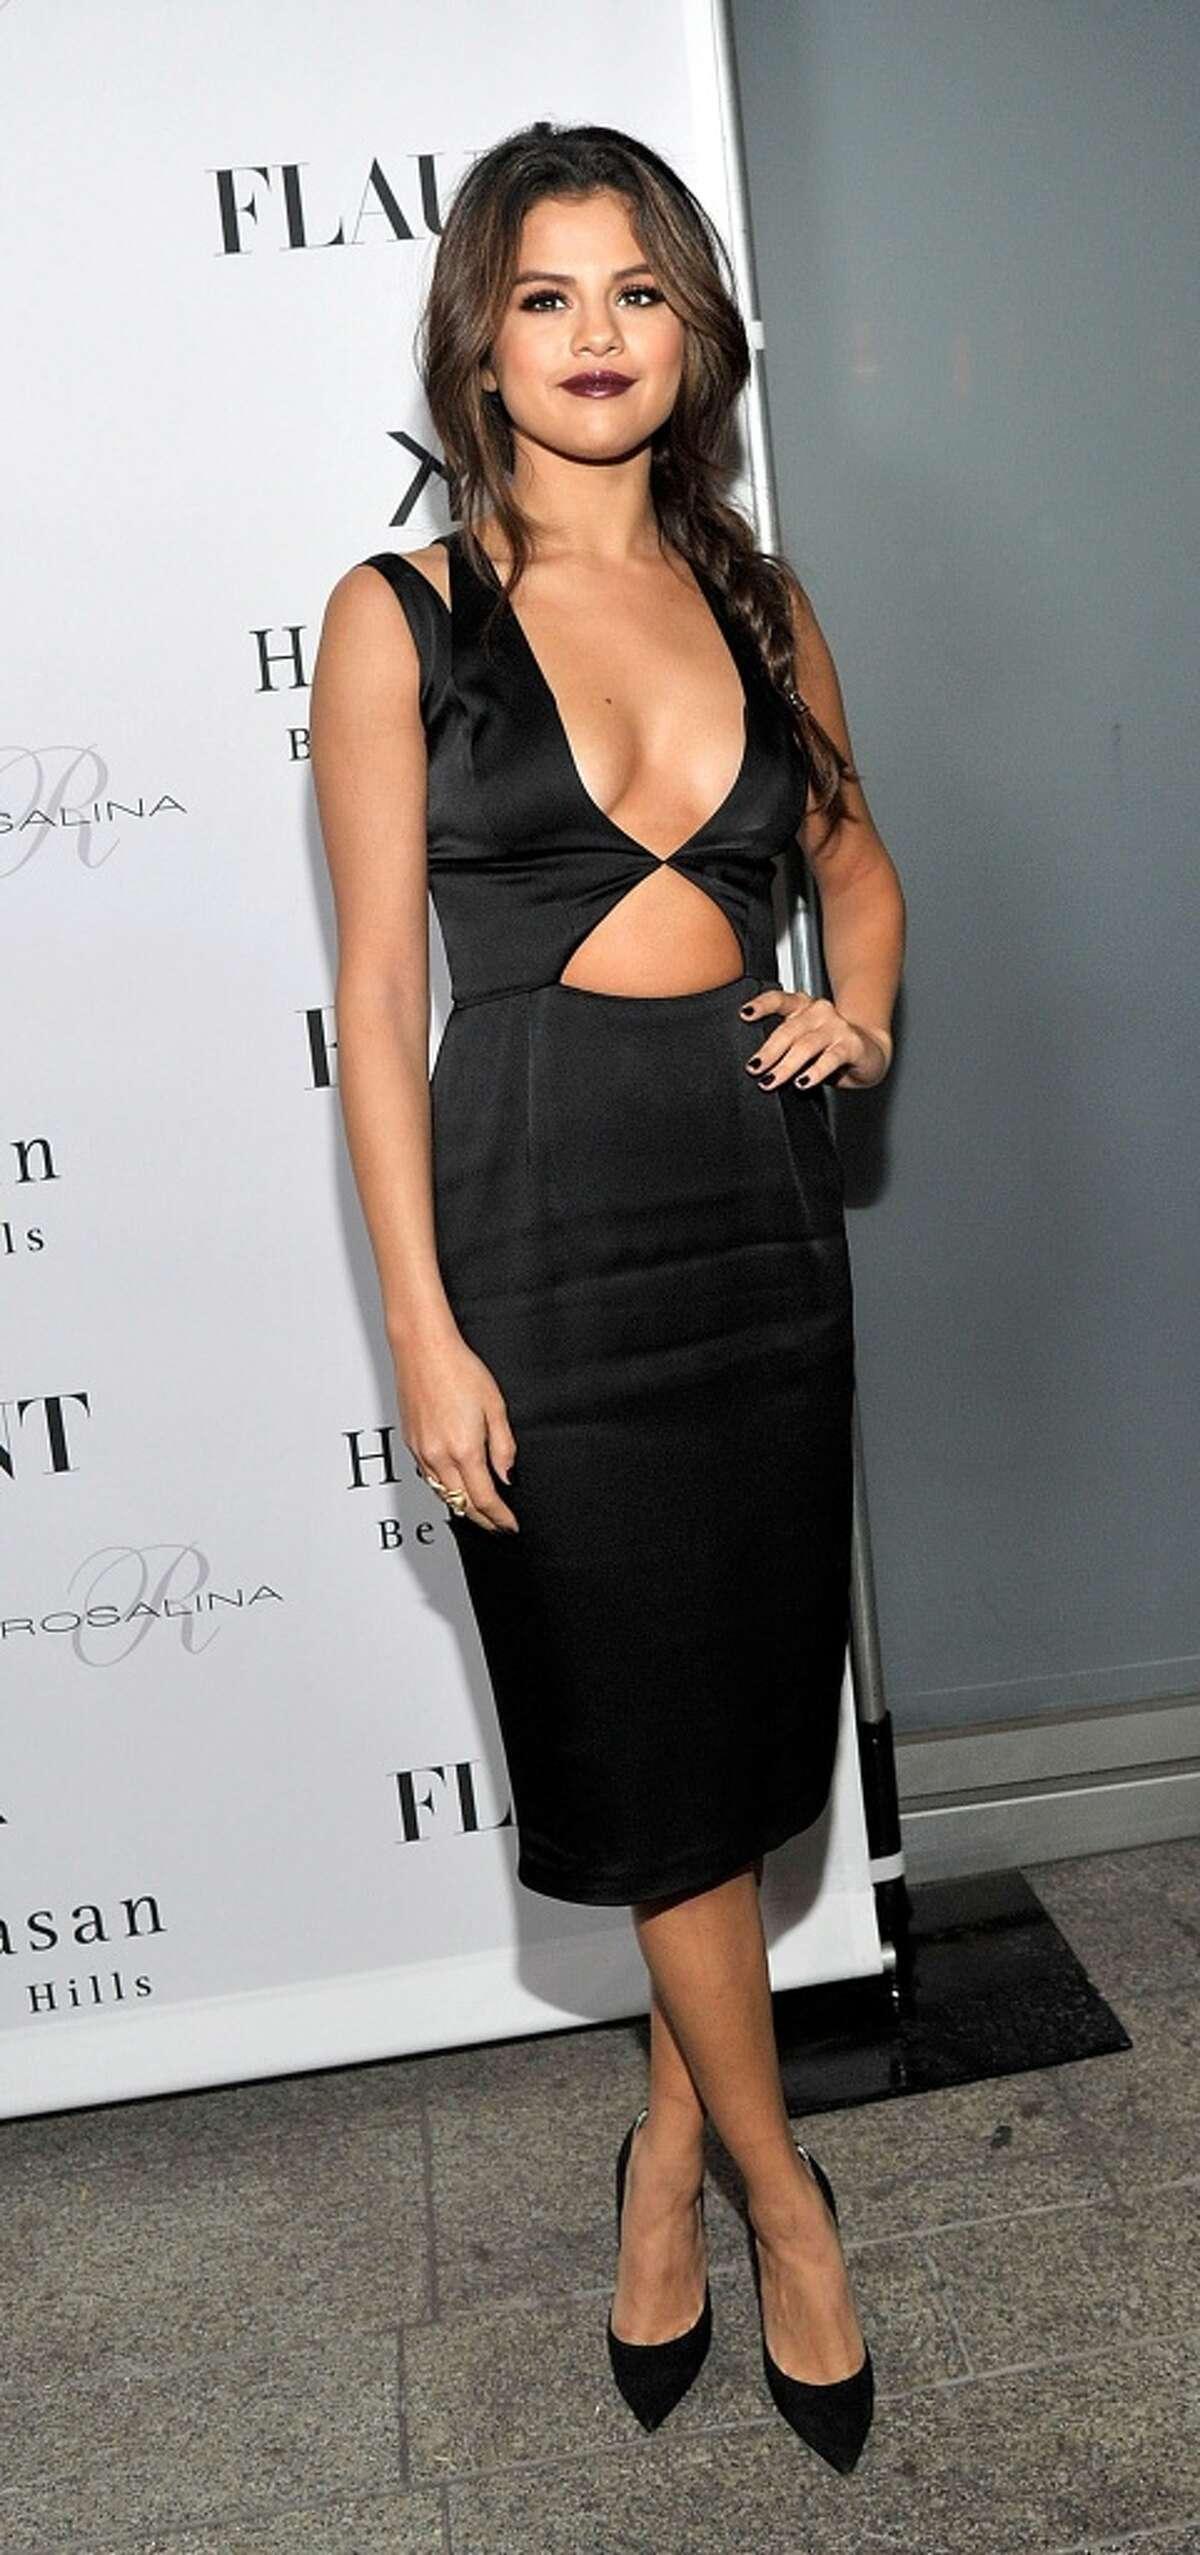 Actress Selena Gomez attends the Flaunt Magazine En Garde! Issue launch party with Selena Gomez and Amanda De Cadenet at Hakkasan Restaurant Beverly Hills on November 7, 2013 in Beverly Hills, California.